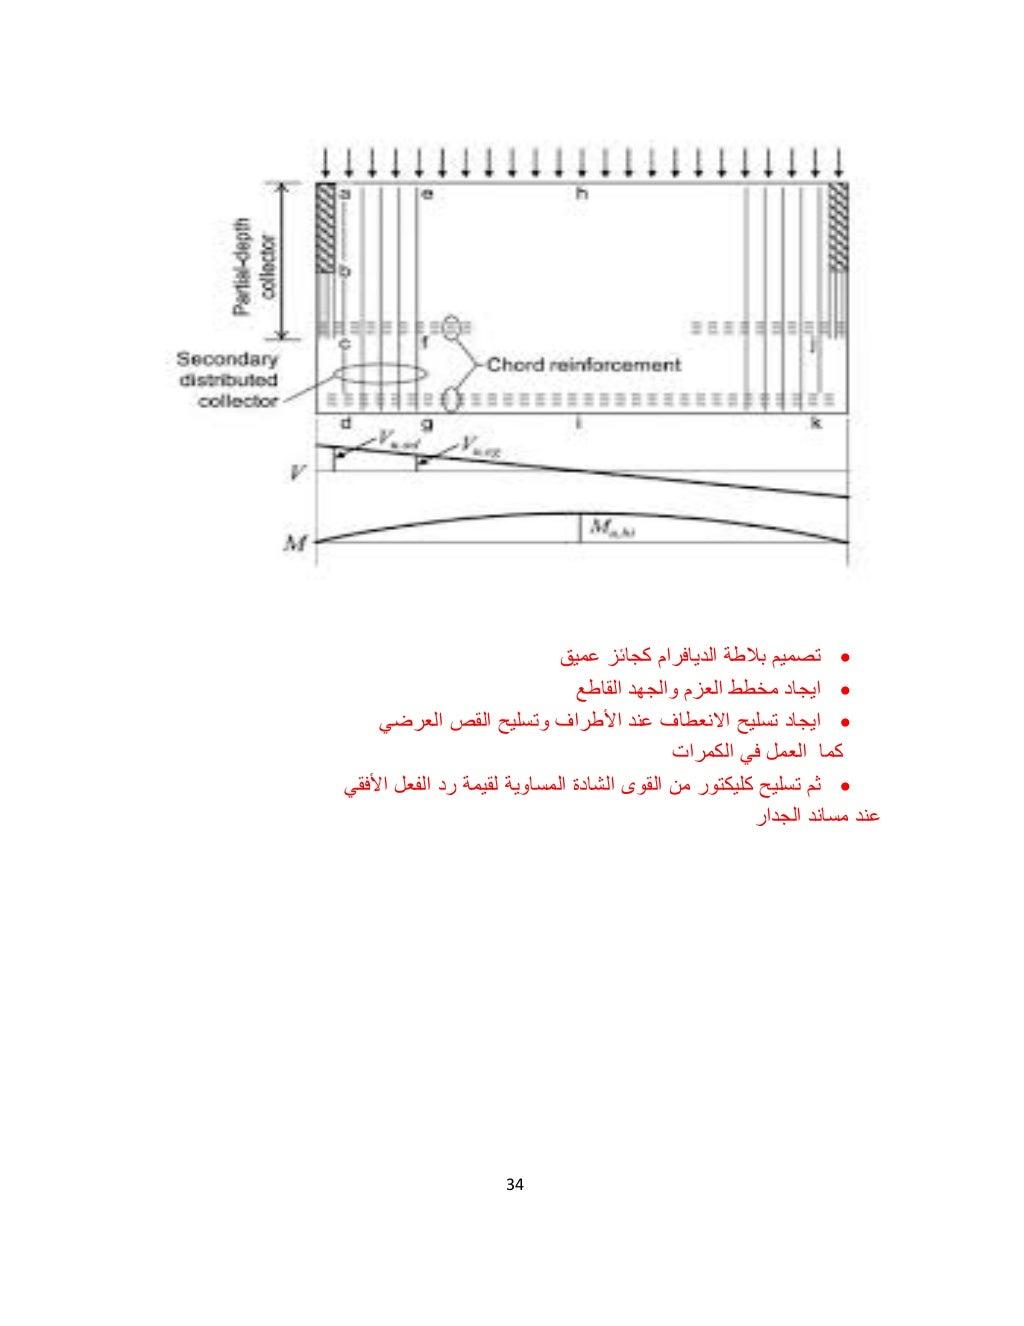 rigid-semi-rigid-flexible-diaphragm-for-seismic-analysis-34-1024.jpg